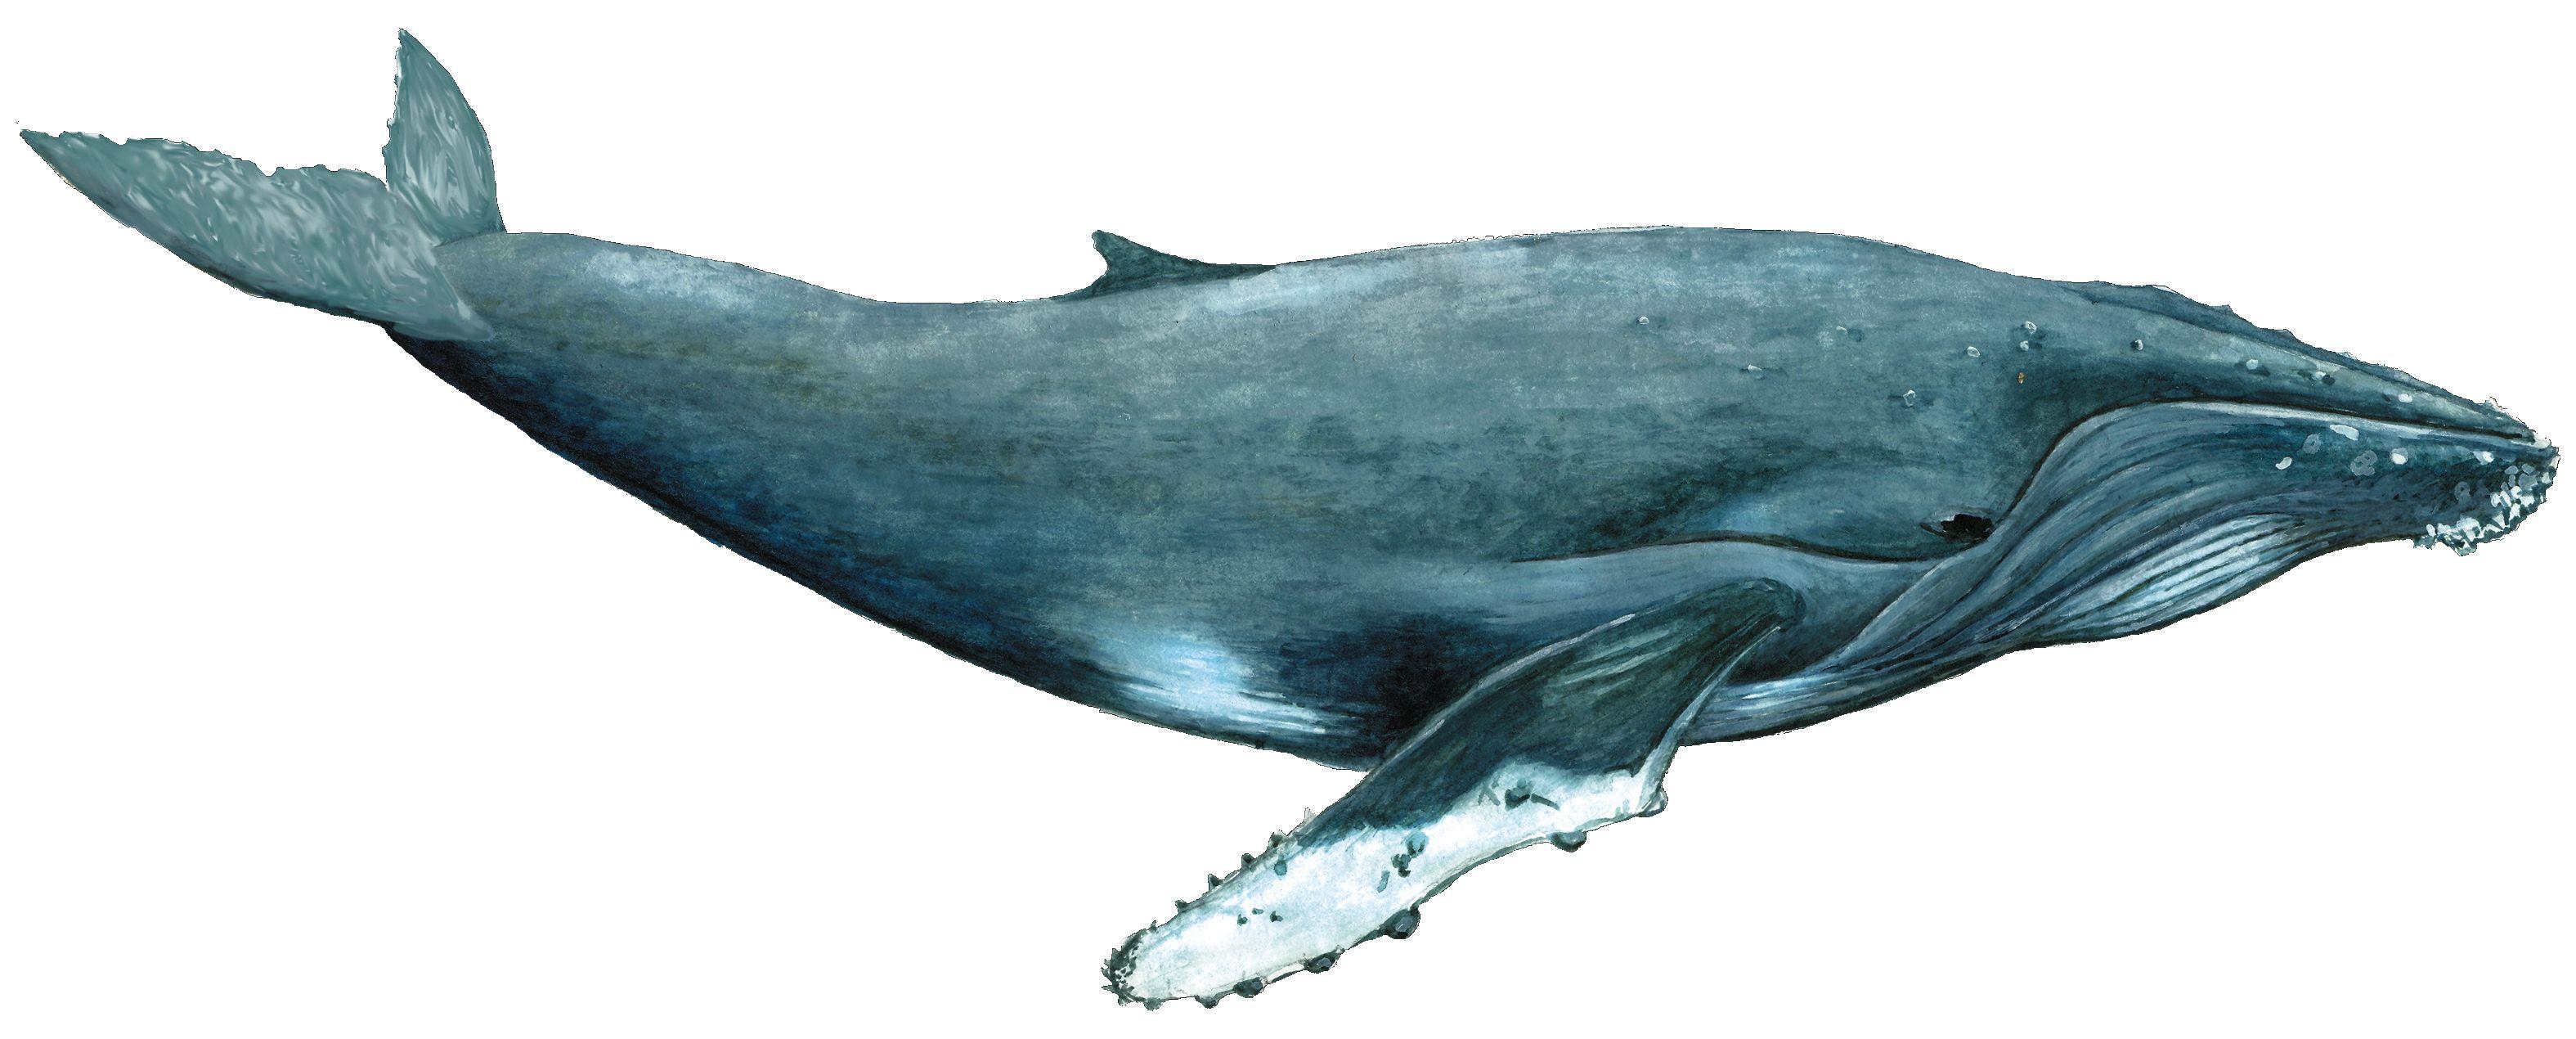 ballena jorobada, megaptera novaengliae   Animales   Pinterest ...